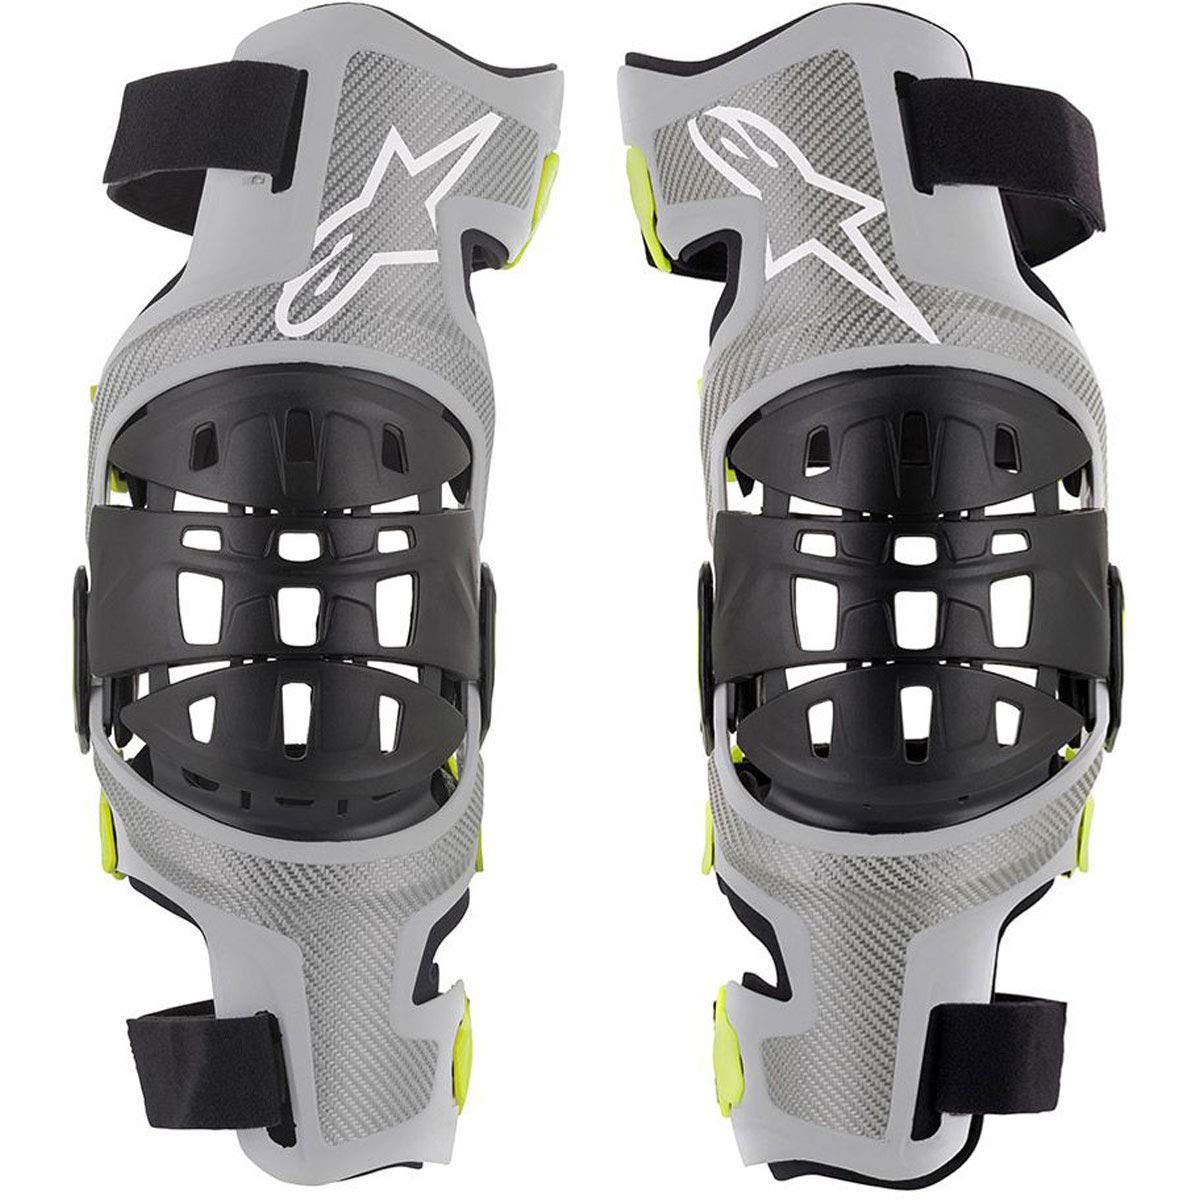 Bionic-7 Off-Road Motocross Knee Brace Set (Medium, Silver Yellow Fluo)